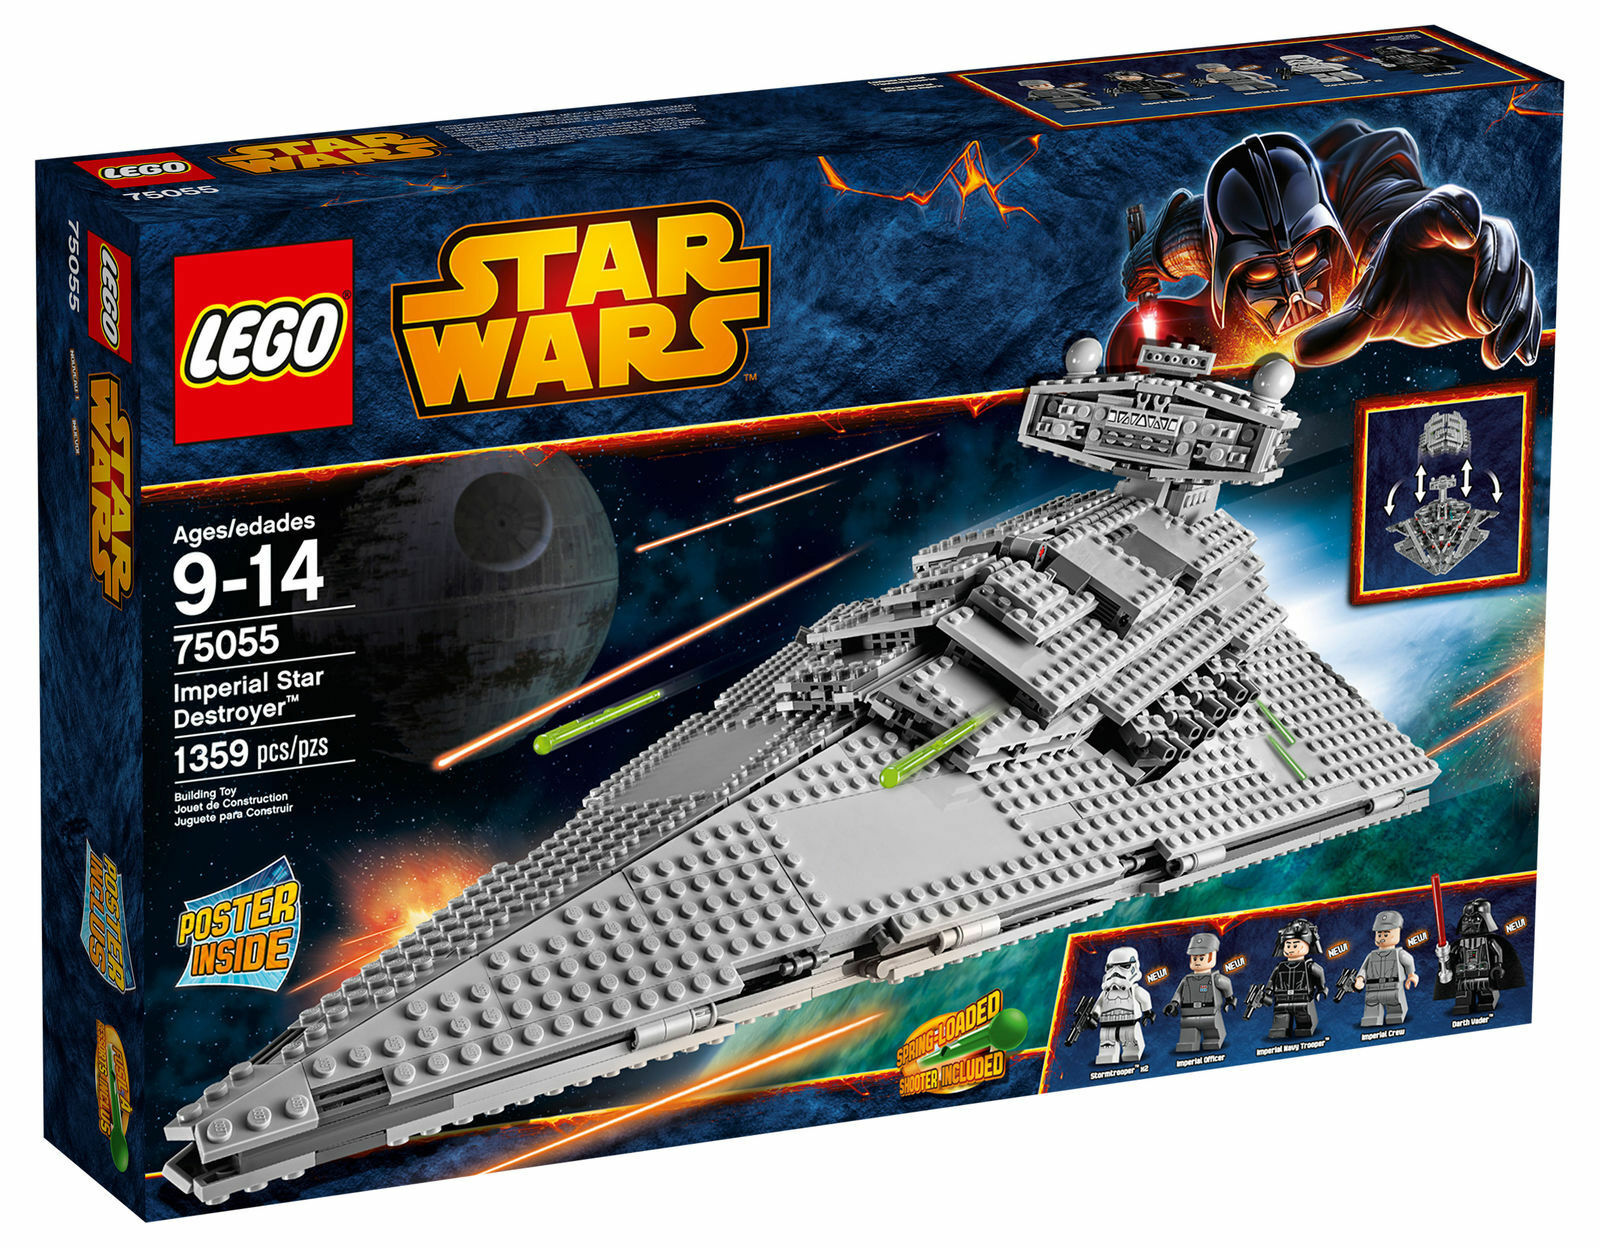 LEGO Star Wars 2014 Imperial Star Destroyer 75055 - NEW Sealed unopened